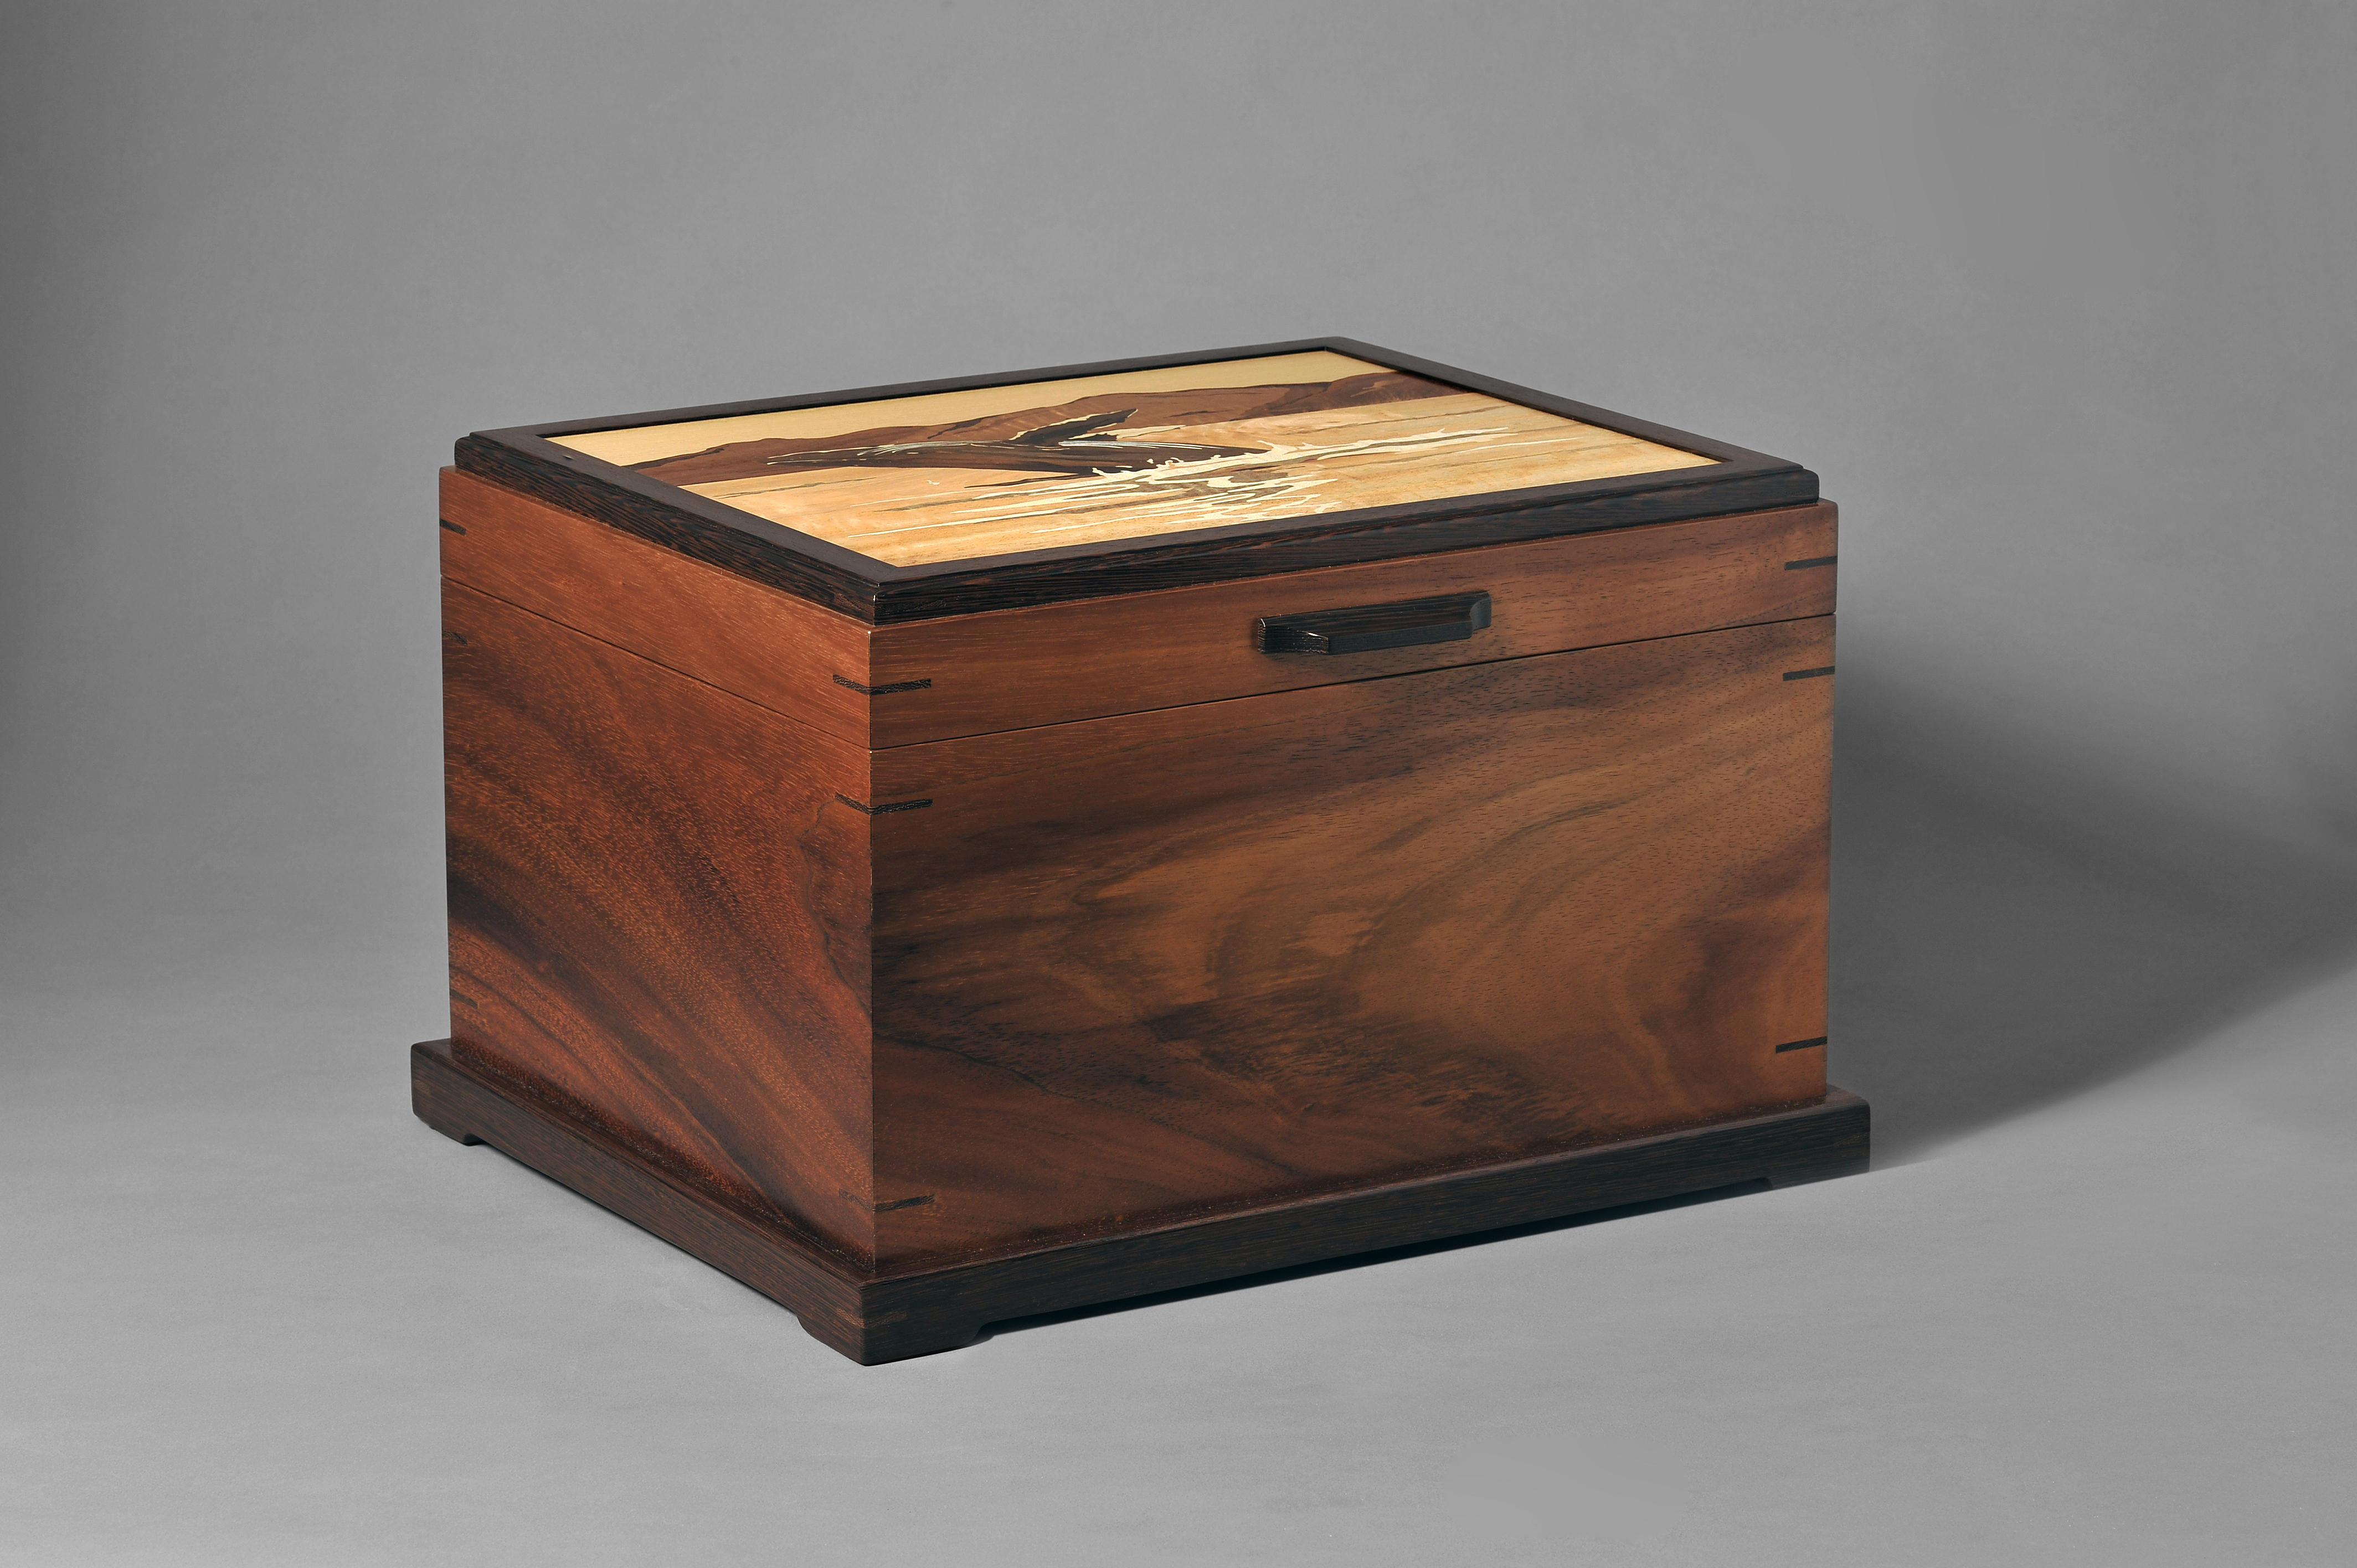 Koa Box with Humback Whale